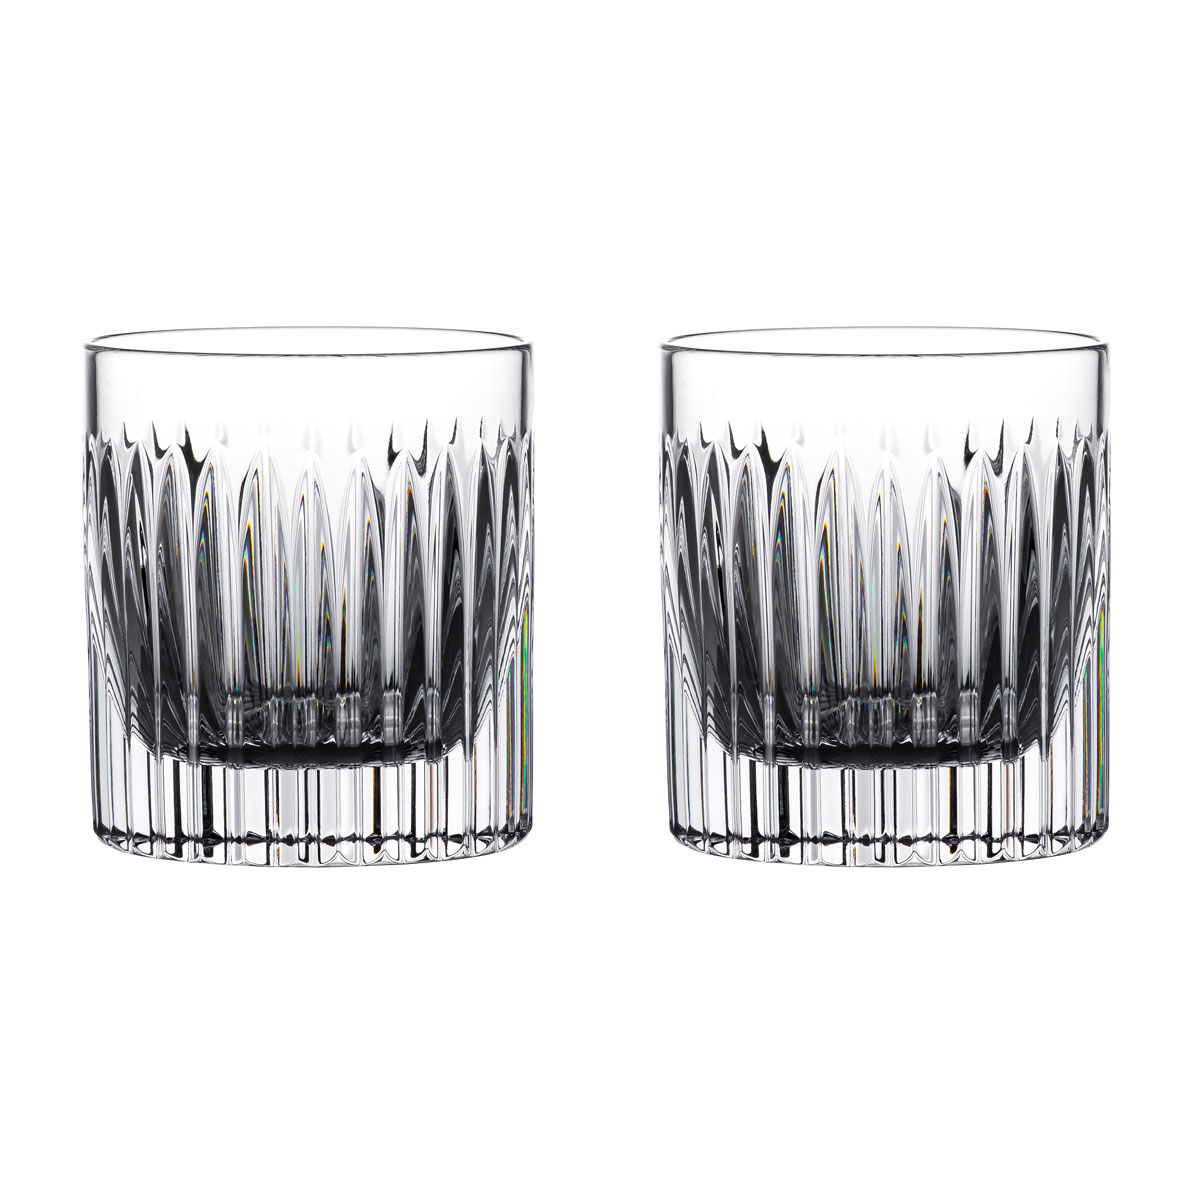 Waterford Crystal Connoisseur Aras Straight Tumbler 6oz. Pair